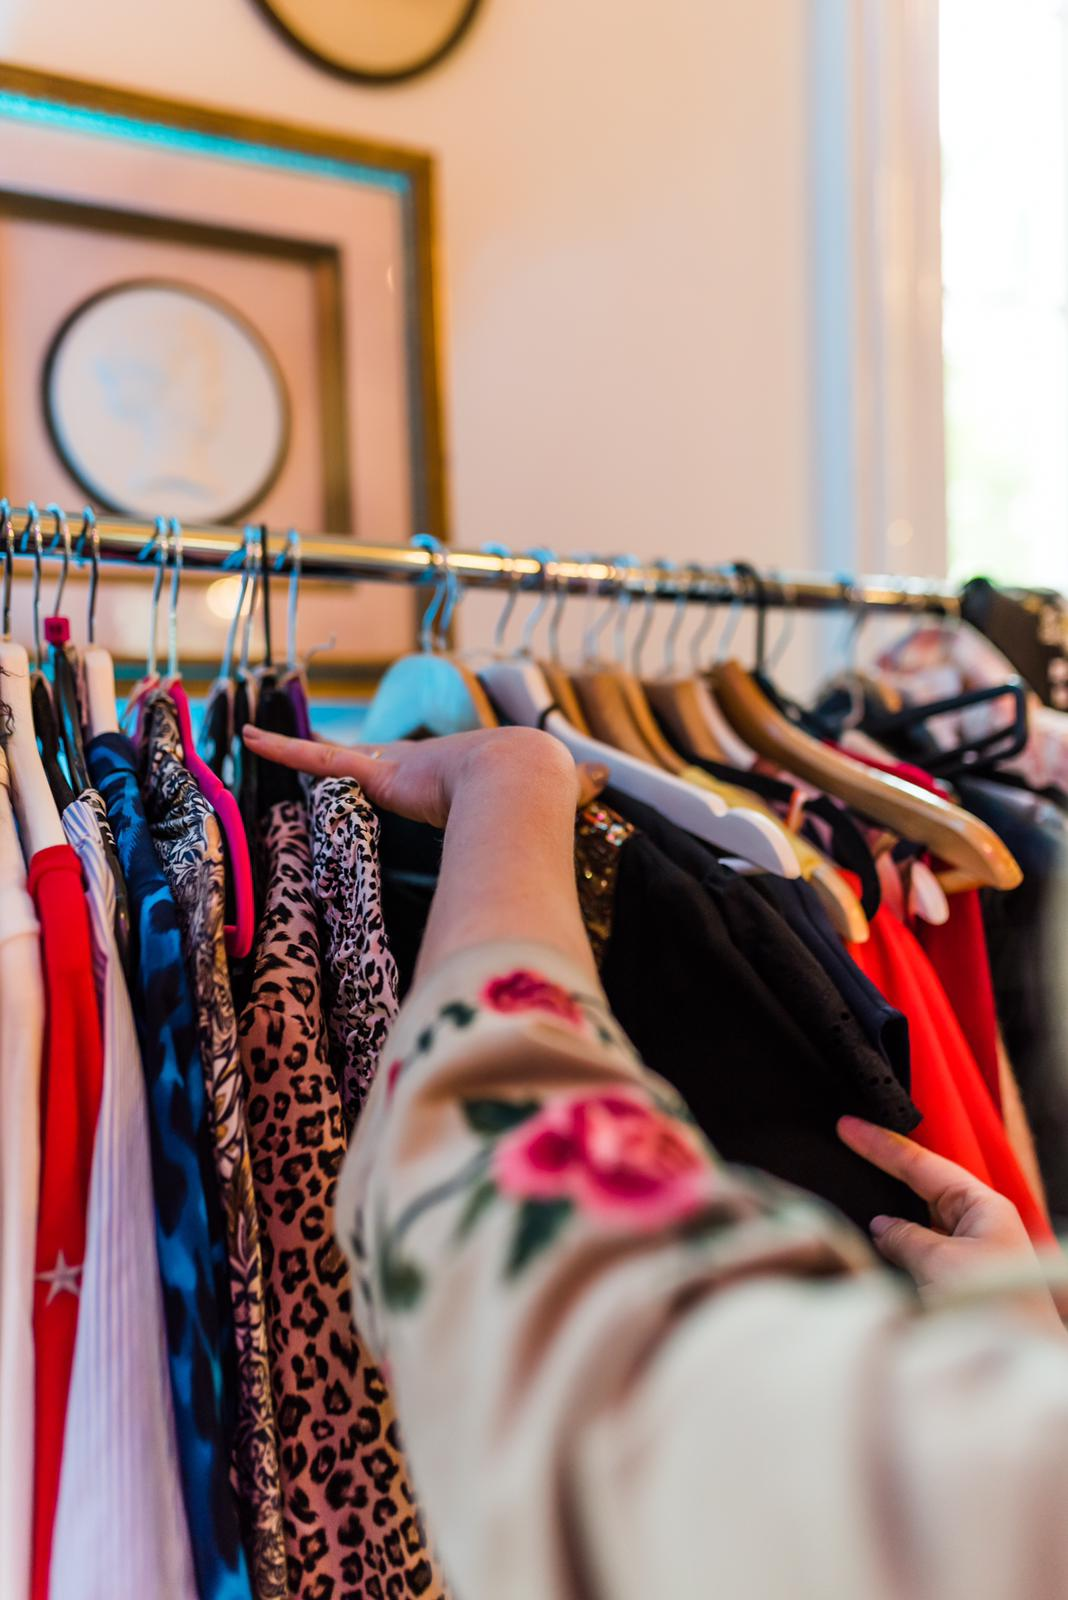 fashion-reboot-mums-the-word-event-tunbridge-wells-kent-support-local-magazine.JPG-4.JPG